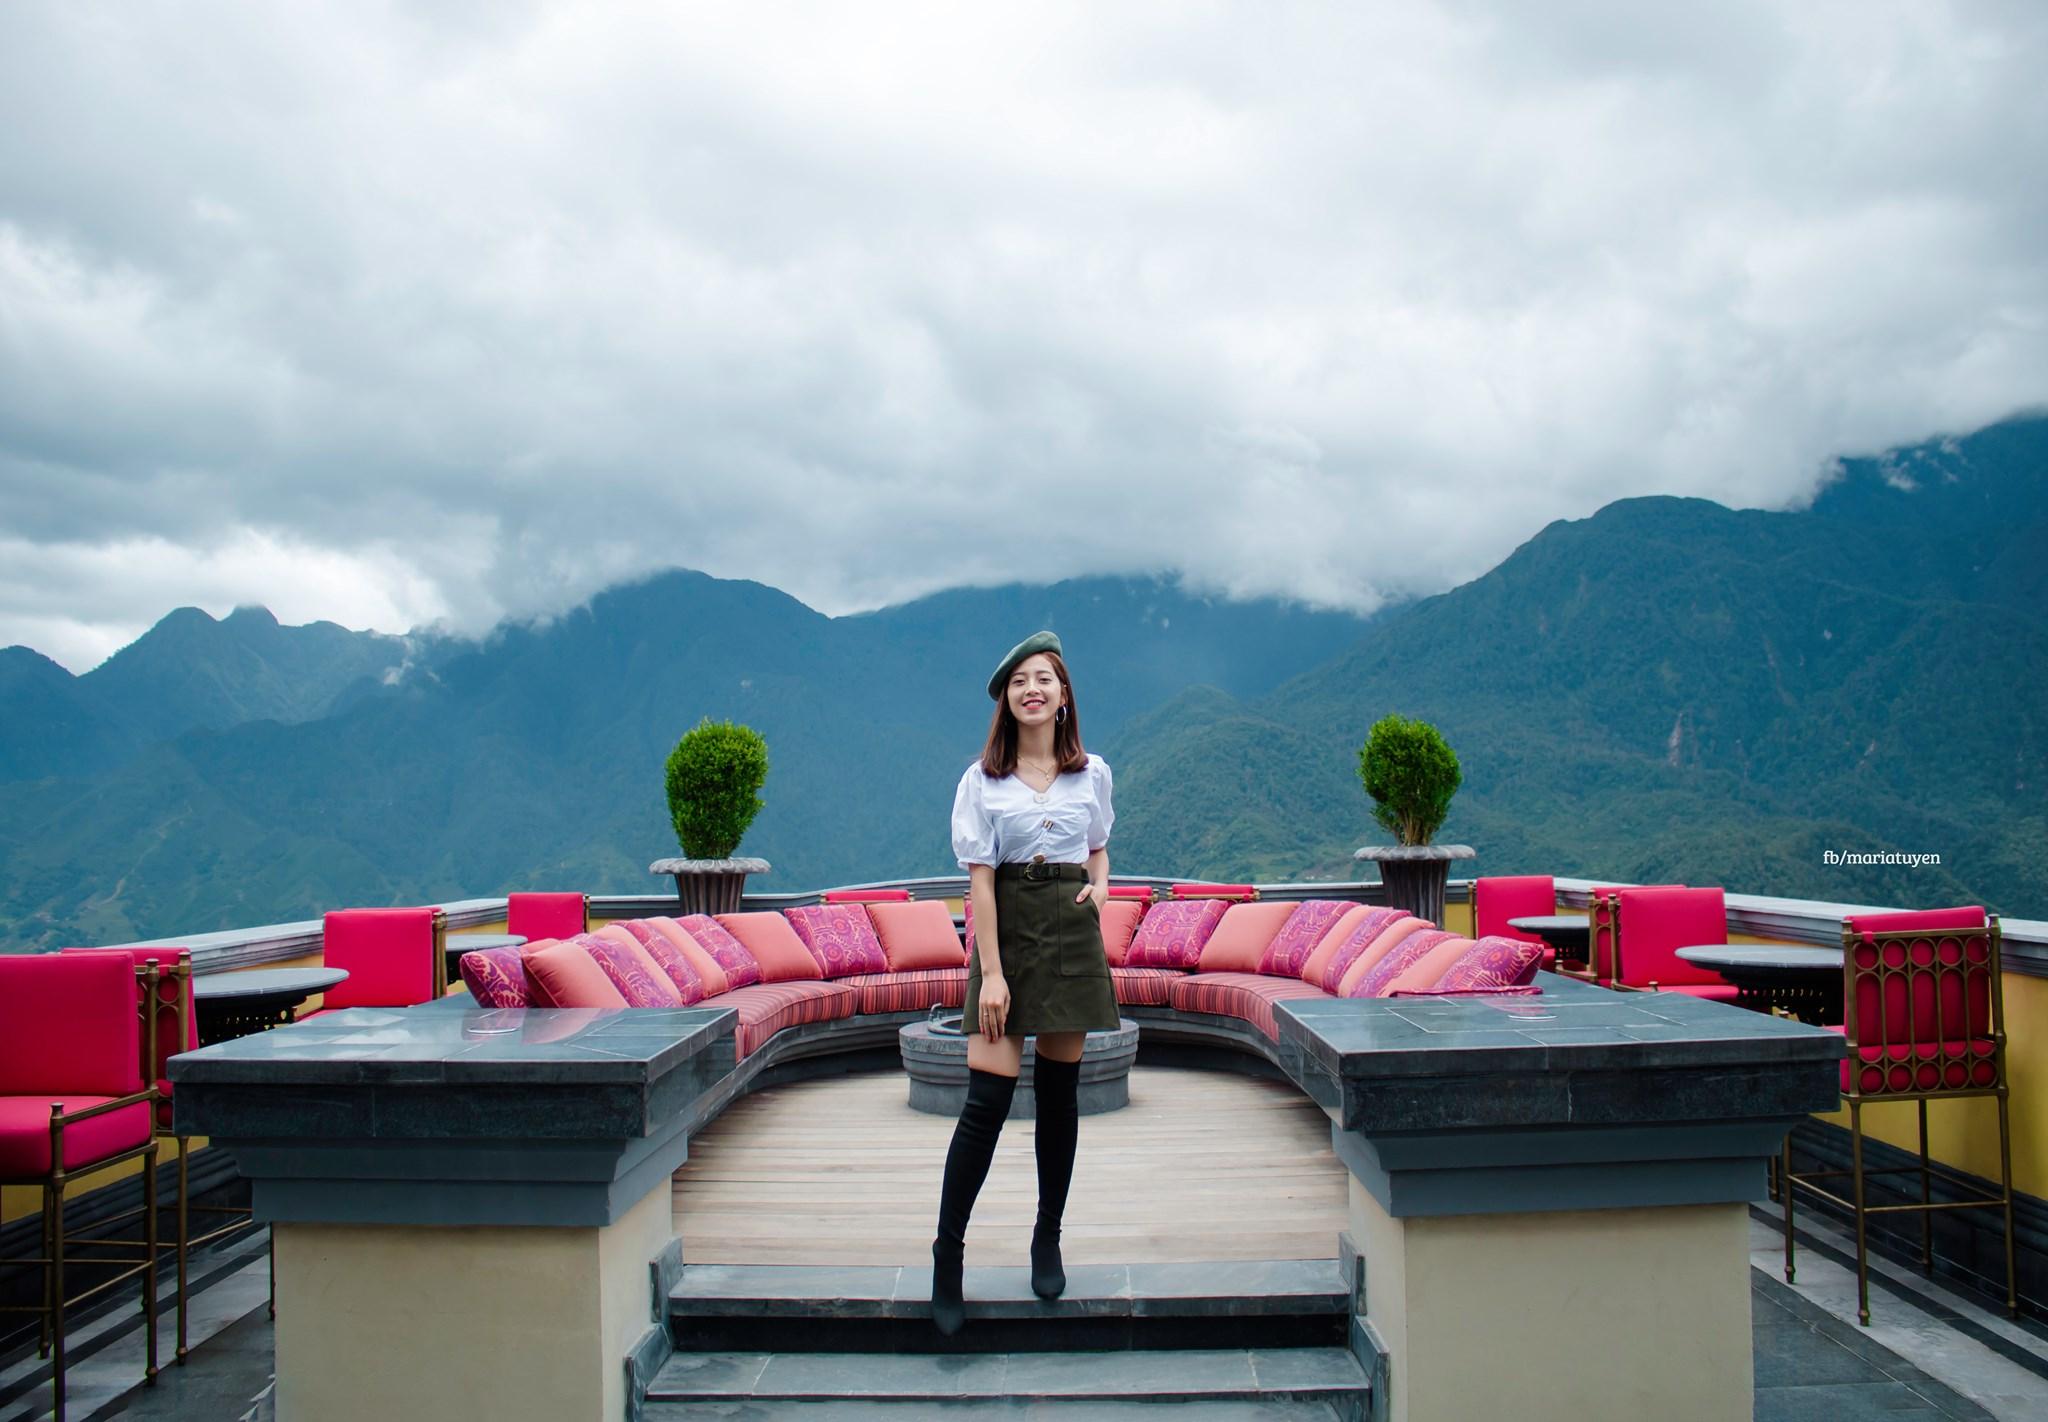 Tong-hop-nhung-dia-diem-du-lich-nui-hot-nhat-trong-dip-30-thang-4-vietmountain-travel15